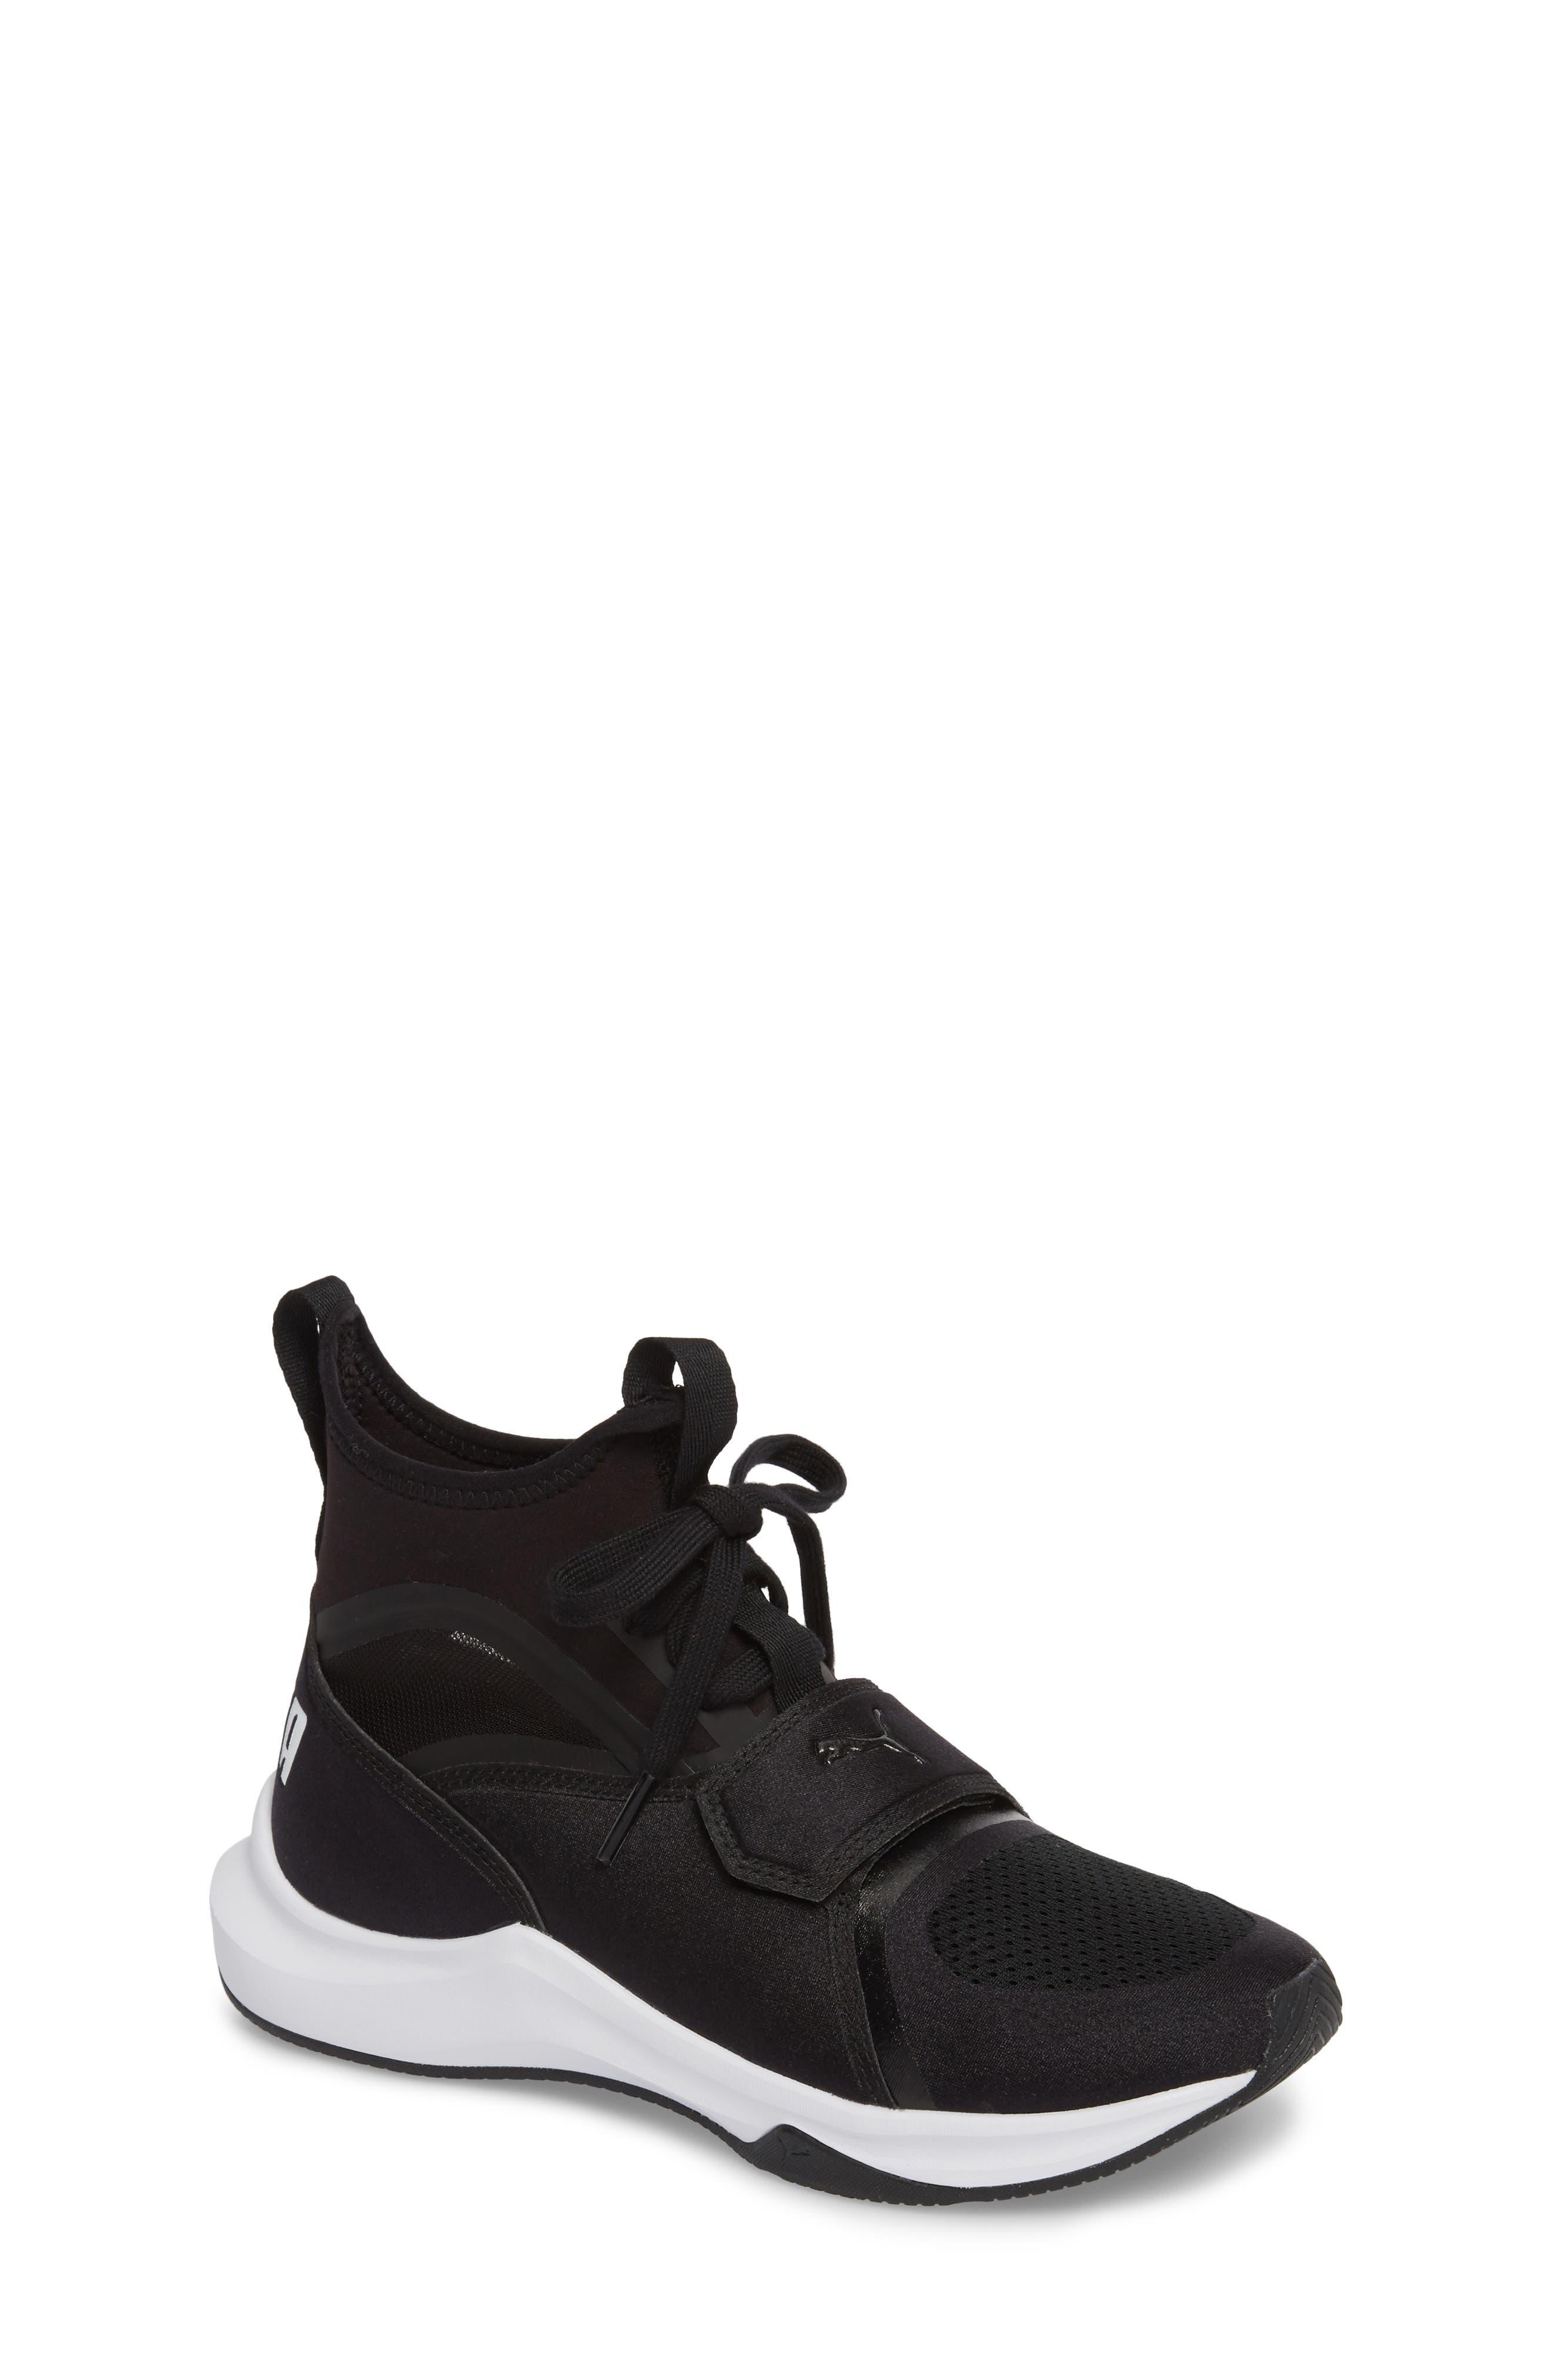 Phenom Jr High Top Sneaker,                         Main,                         color, Puma Black/ Puma White